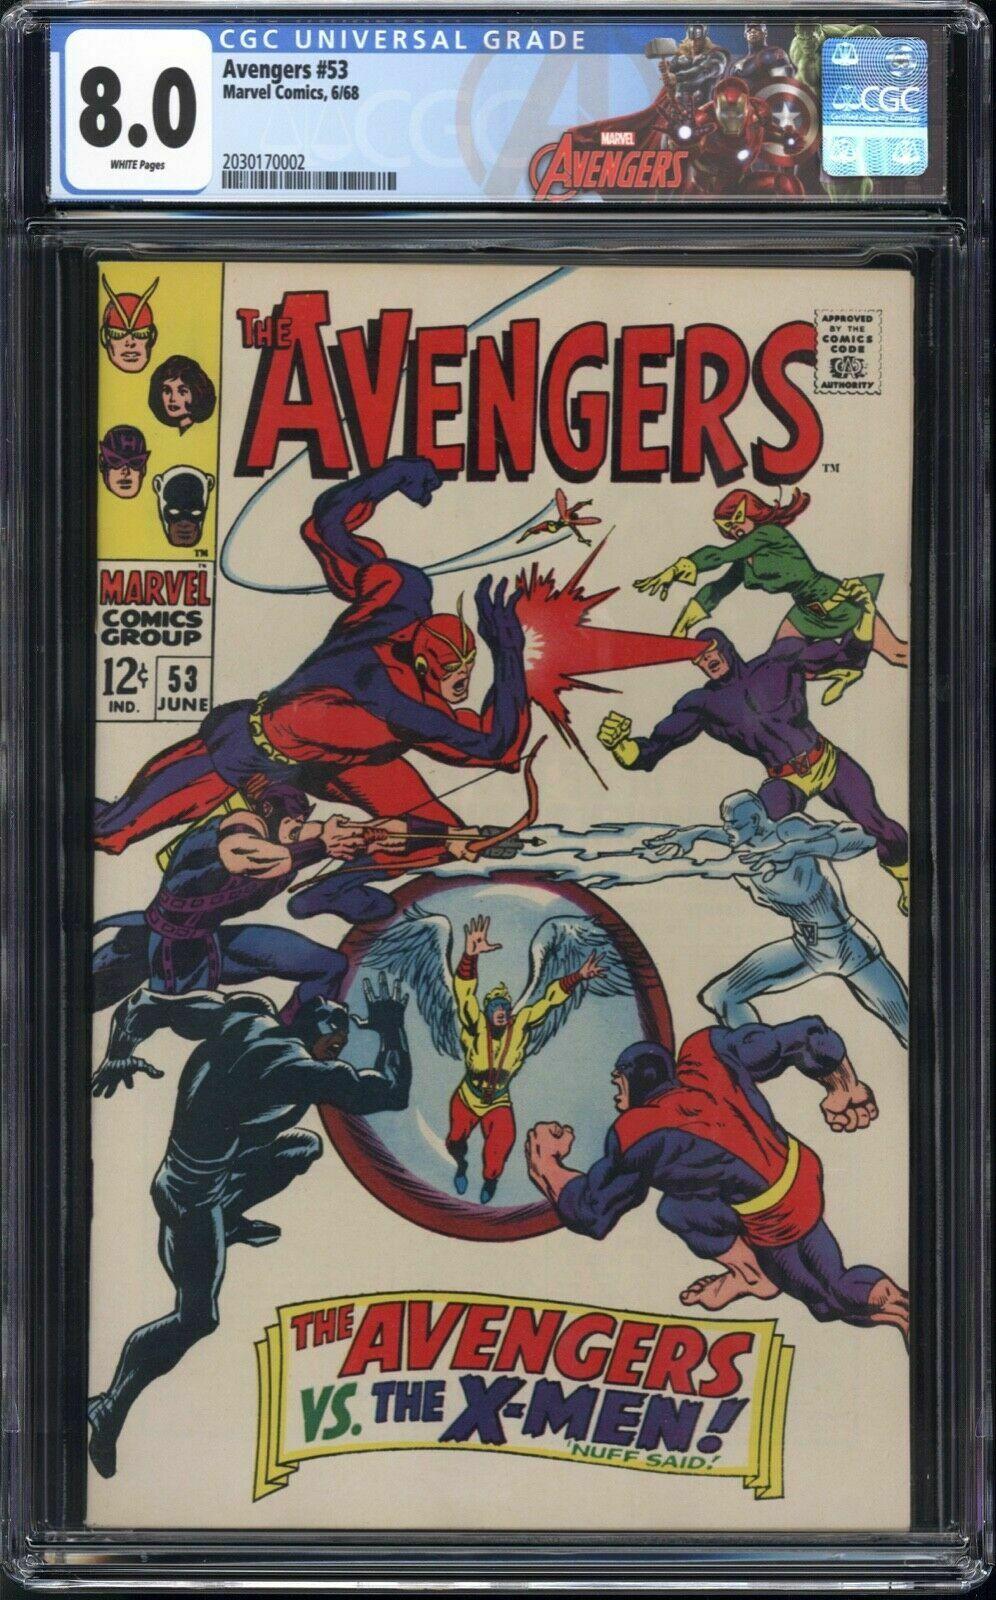 Avengers #53 CGC 8.0 Avengers Vs. X-Men (Special Avengers Label) White Pages